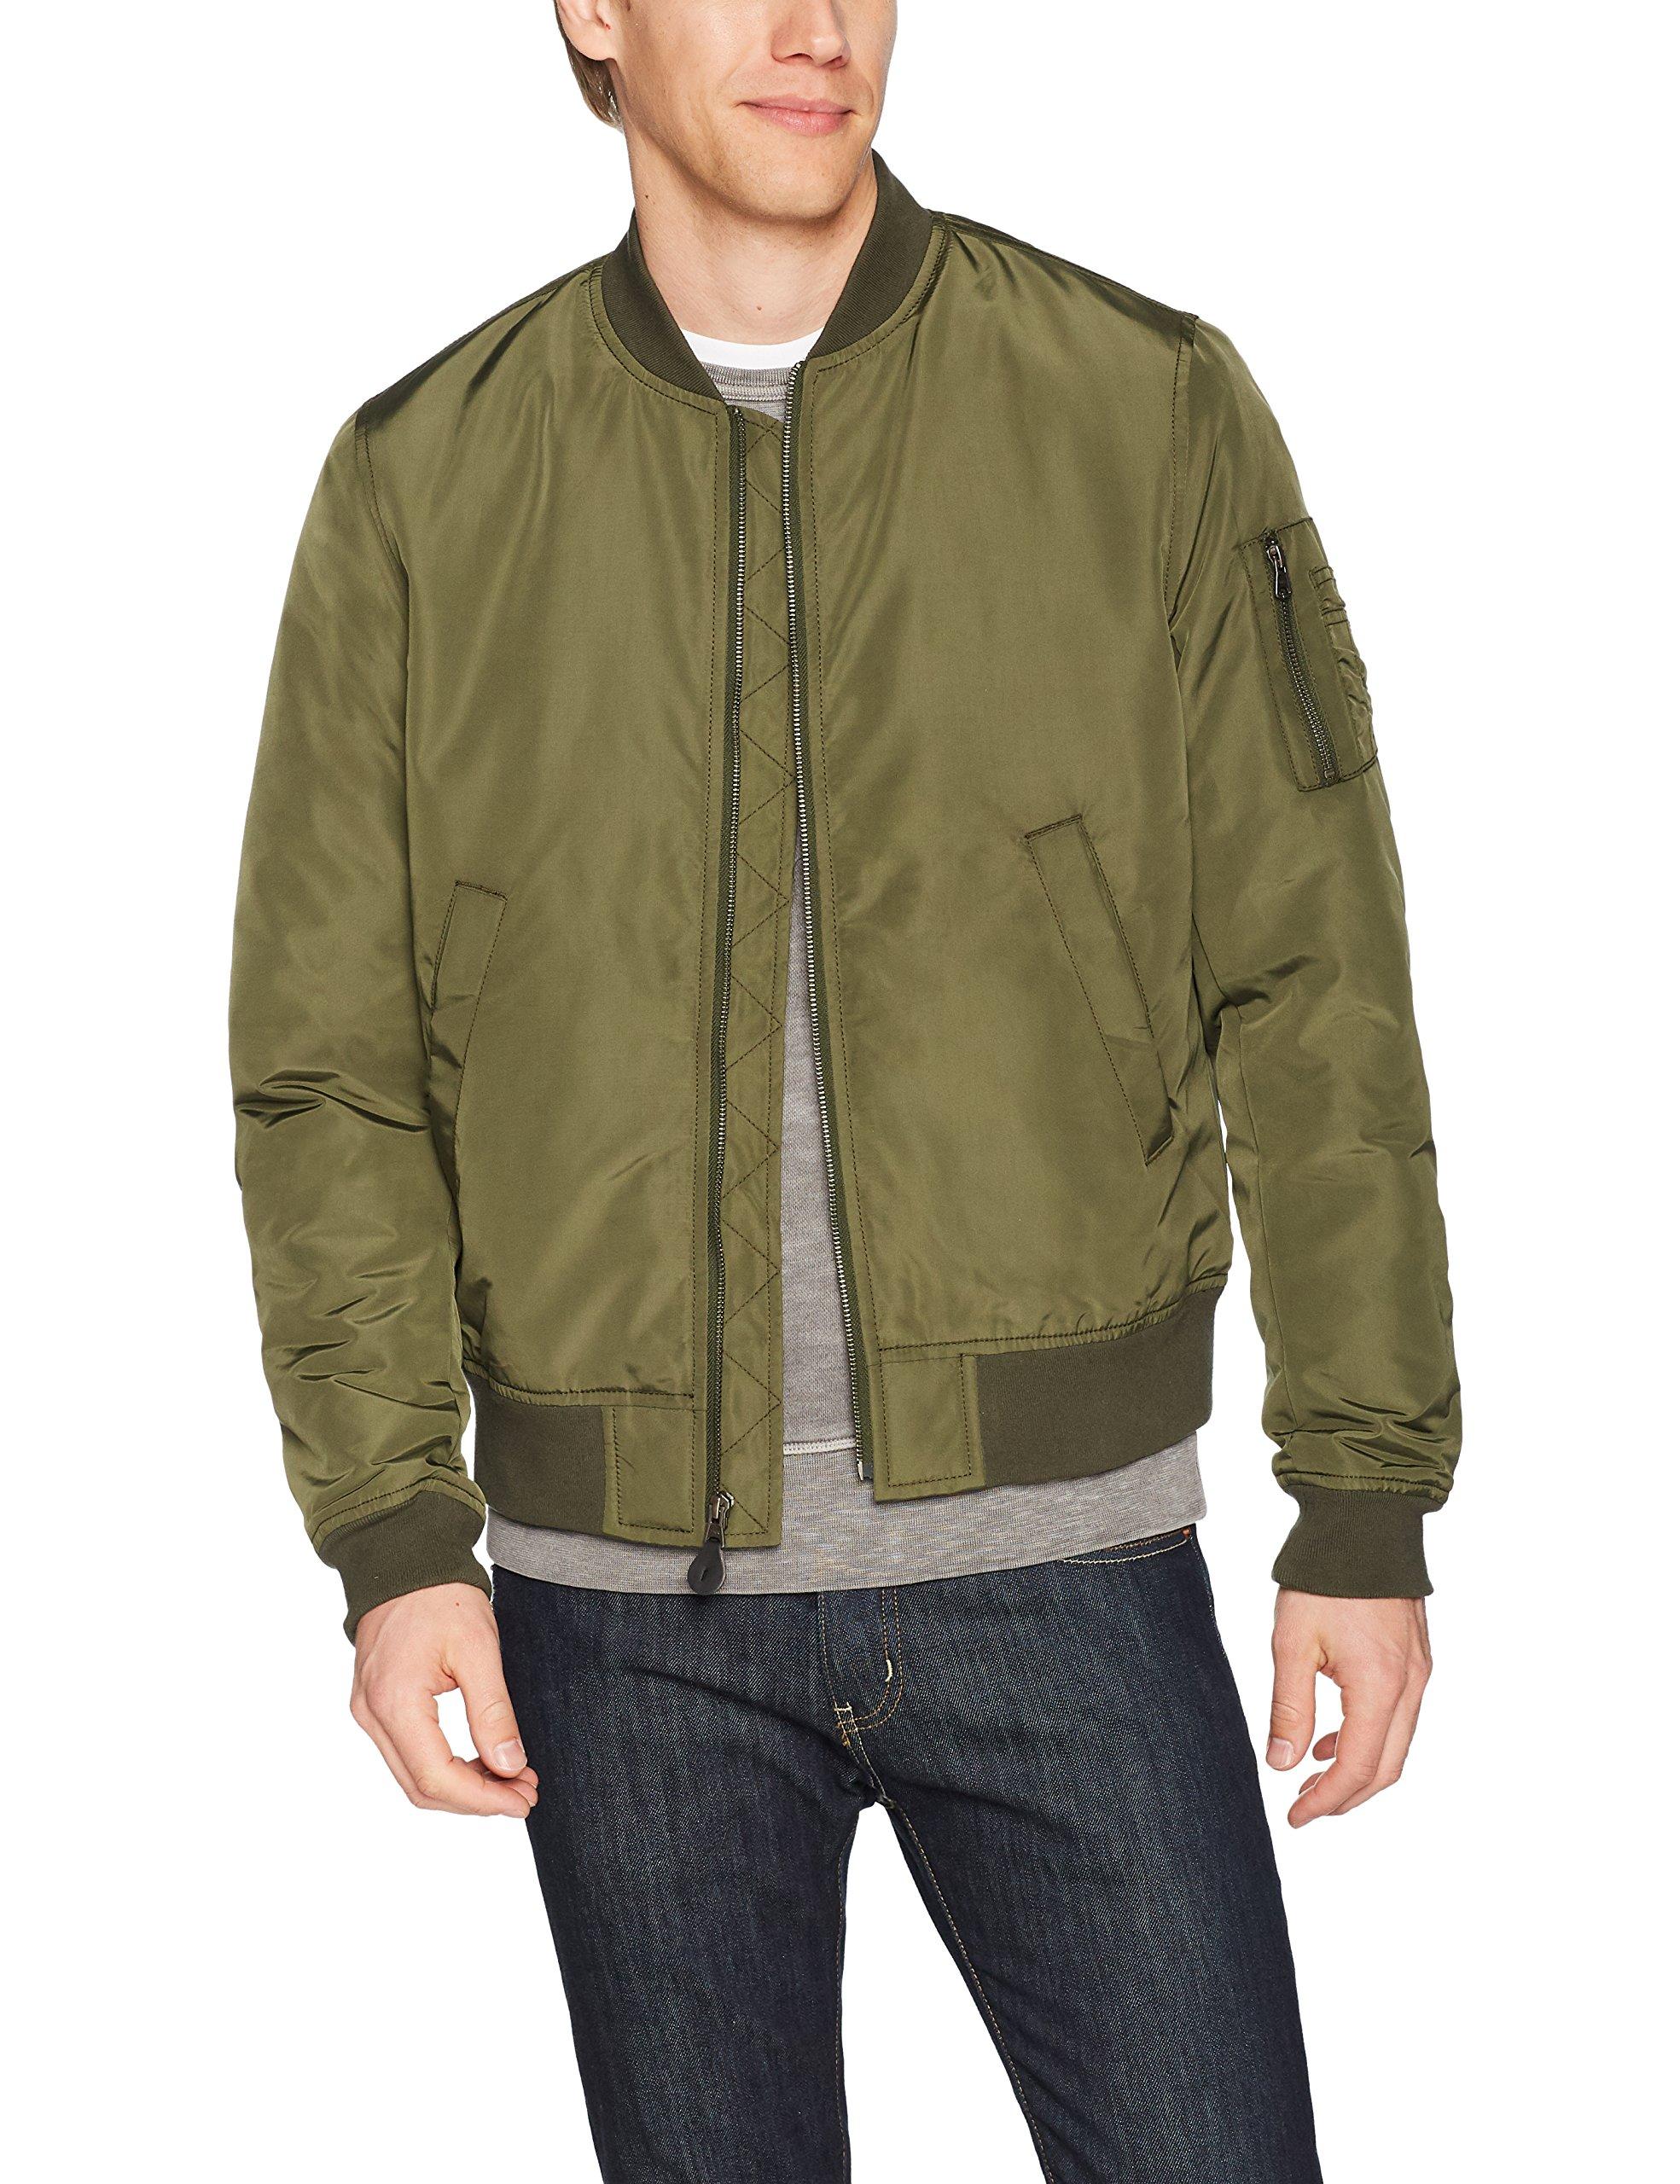 Goodthreads Men's Bomber Jacket, Olive, Large by Goodthreads